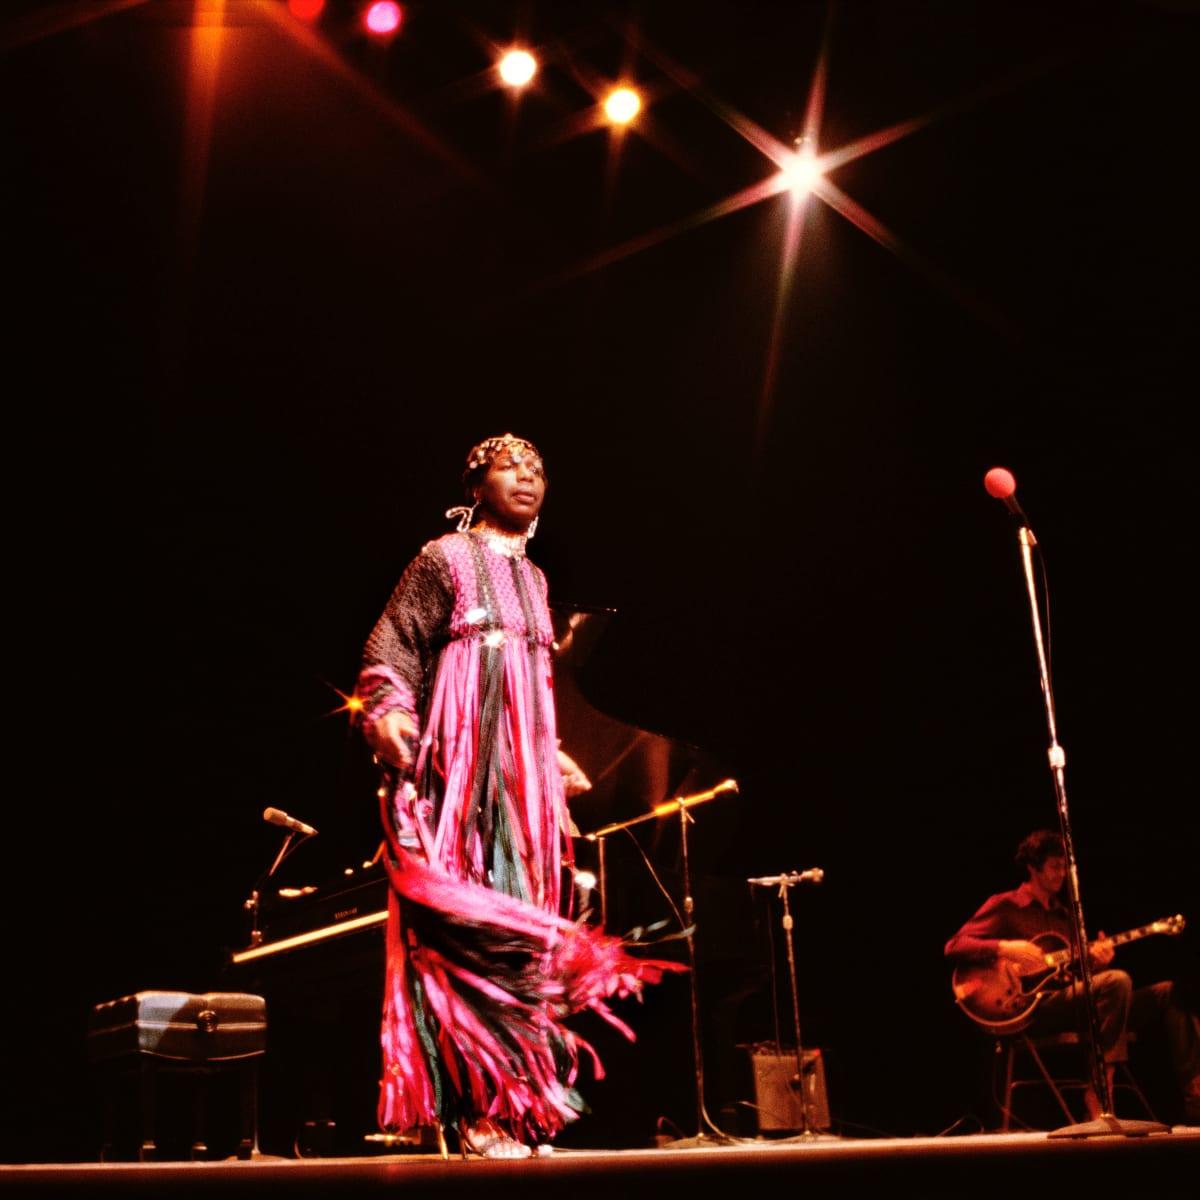 Kwame Brathwaite, Untitled (Nina Simone at Beacon Theater), 1974 c., printed 2018